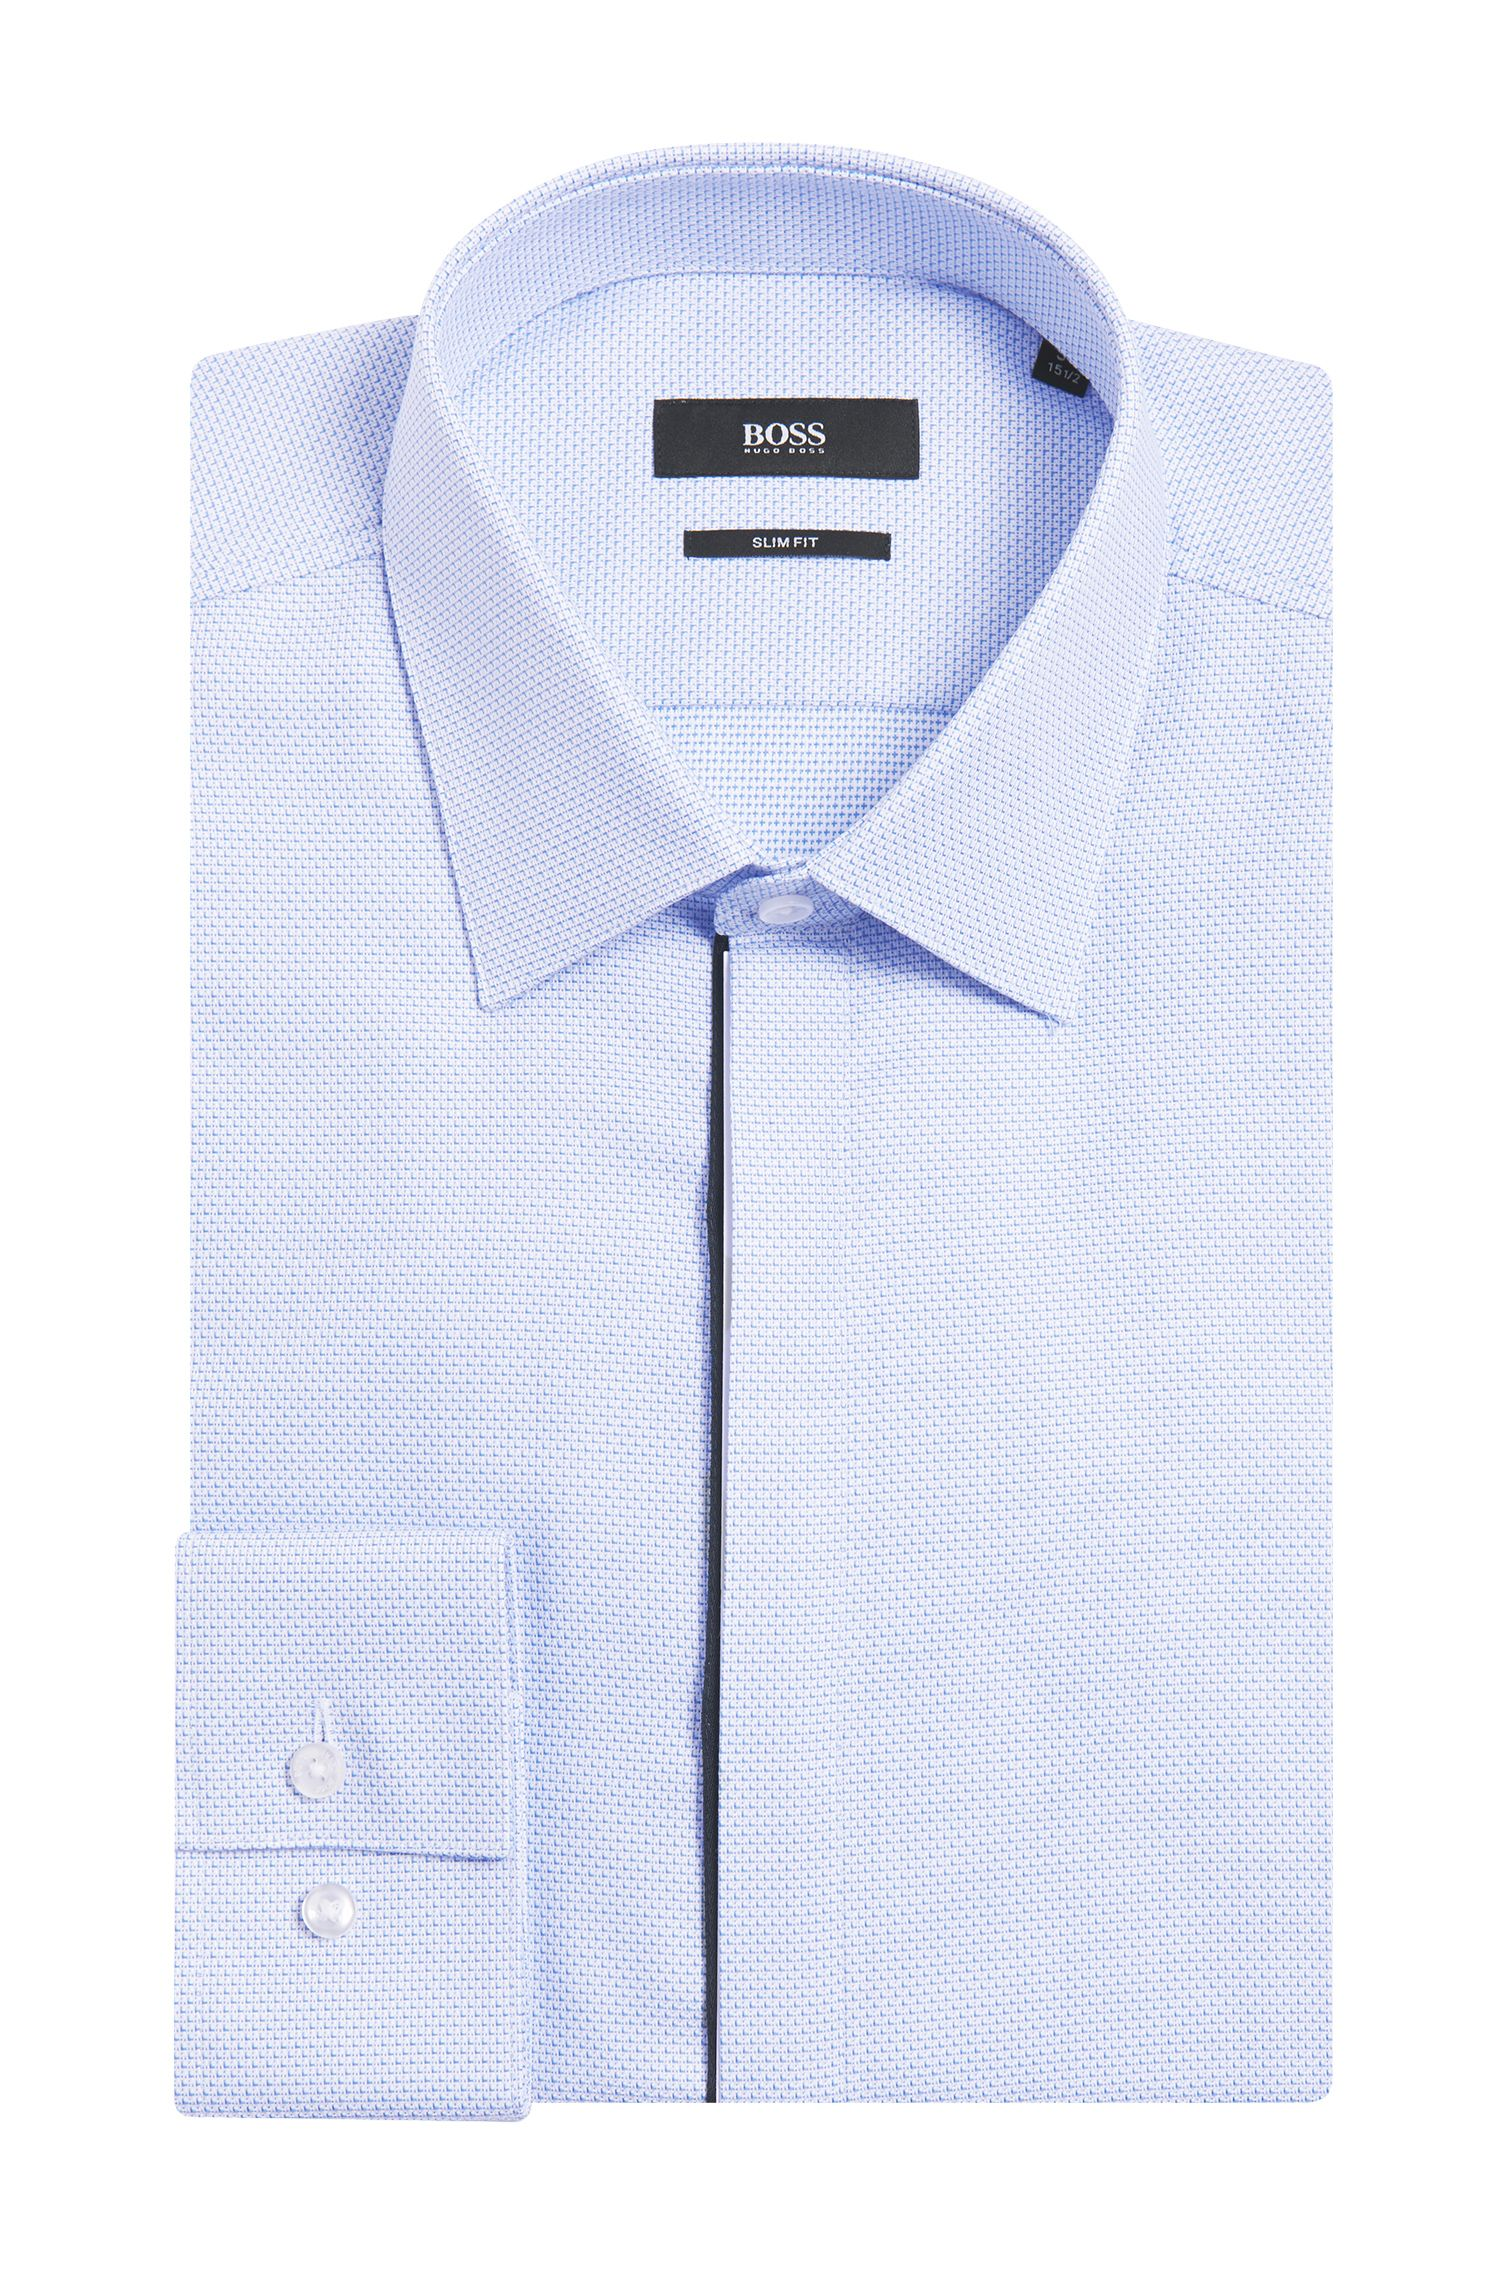 'Jamis' | Slim Fit, Cotton Patterned Dress Shirt